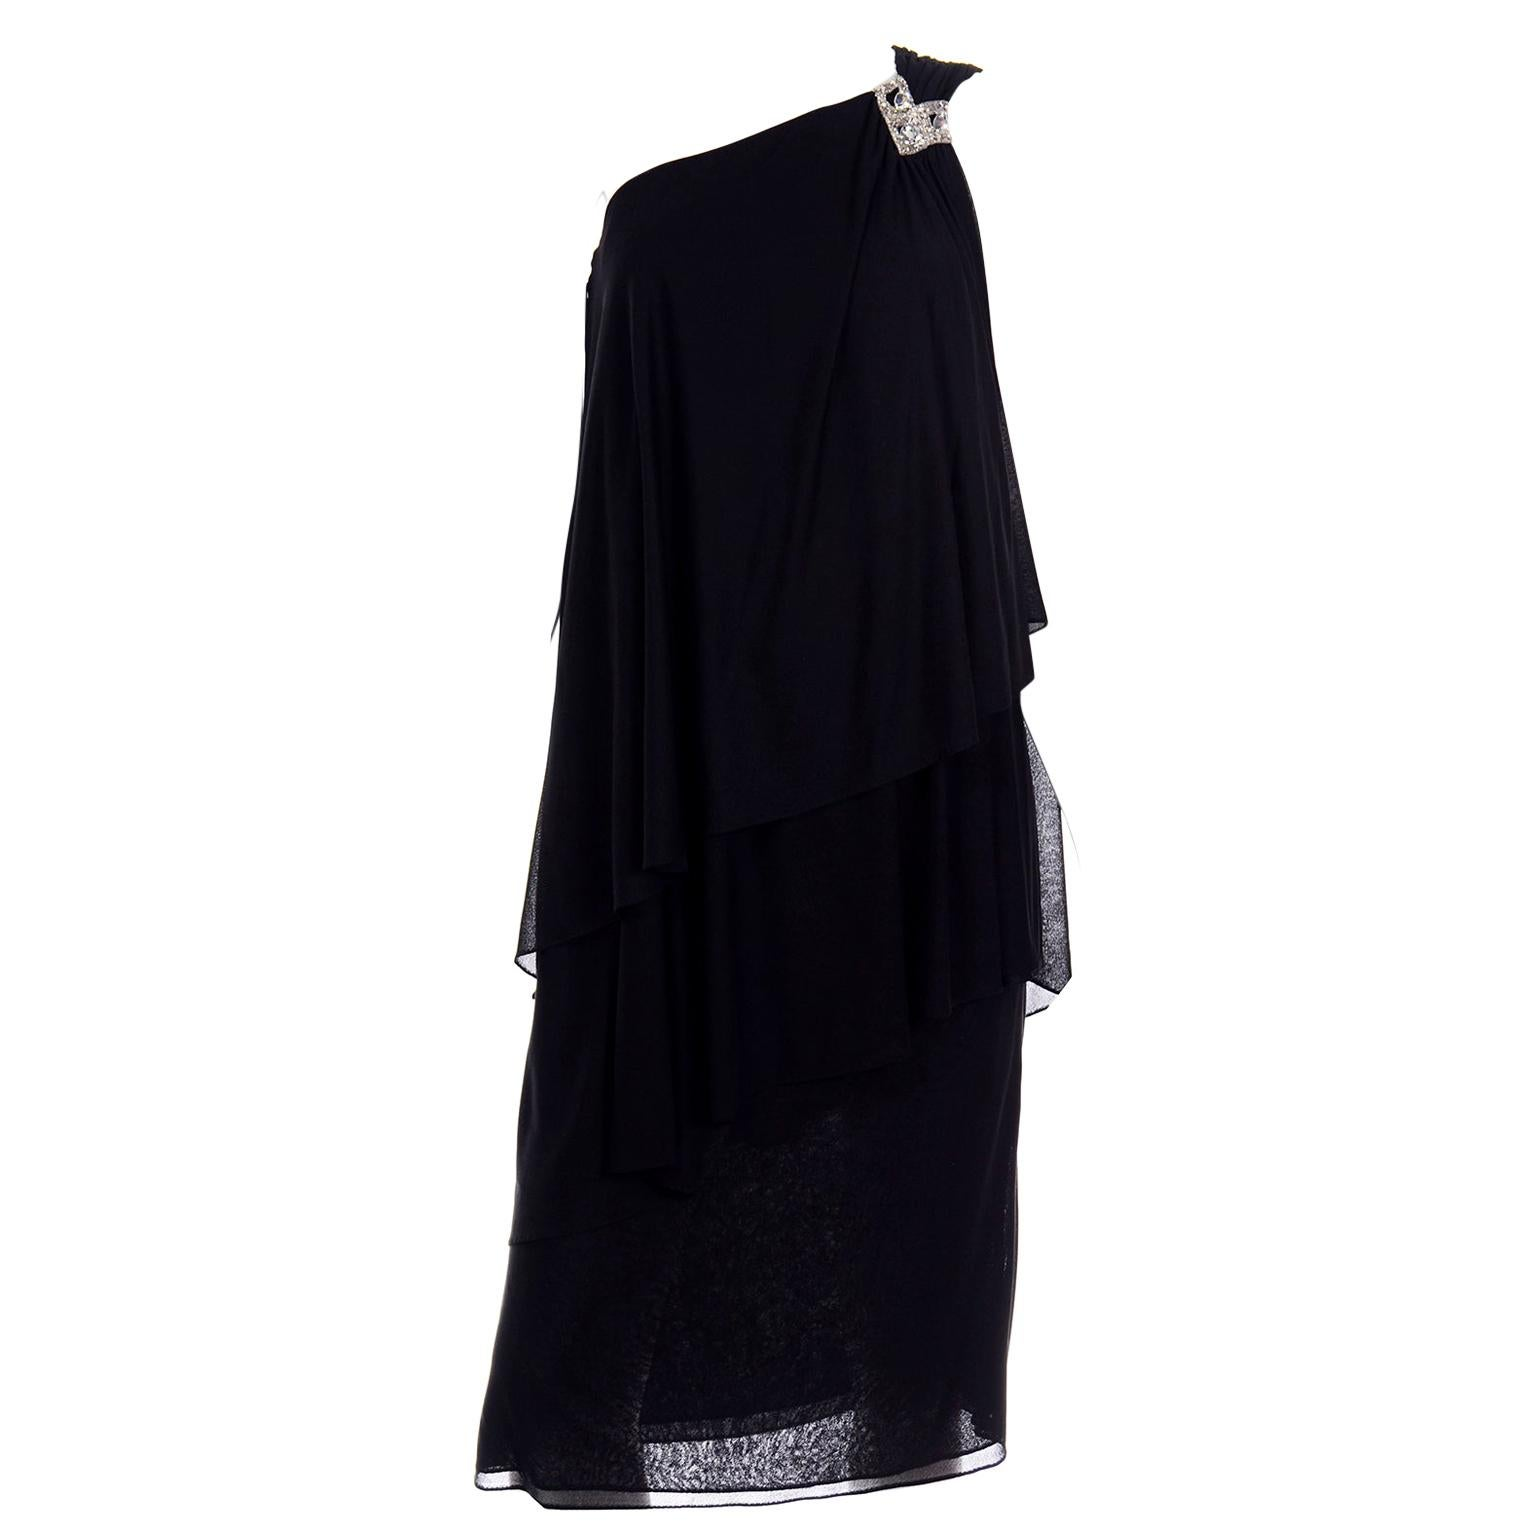 Lilli Diamond Vintage Black 1970s One Shoulder Grecian Evening Dress w Jewel